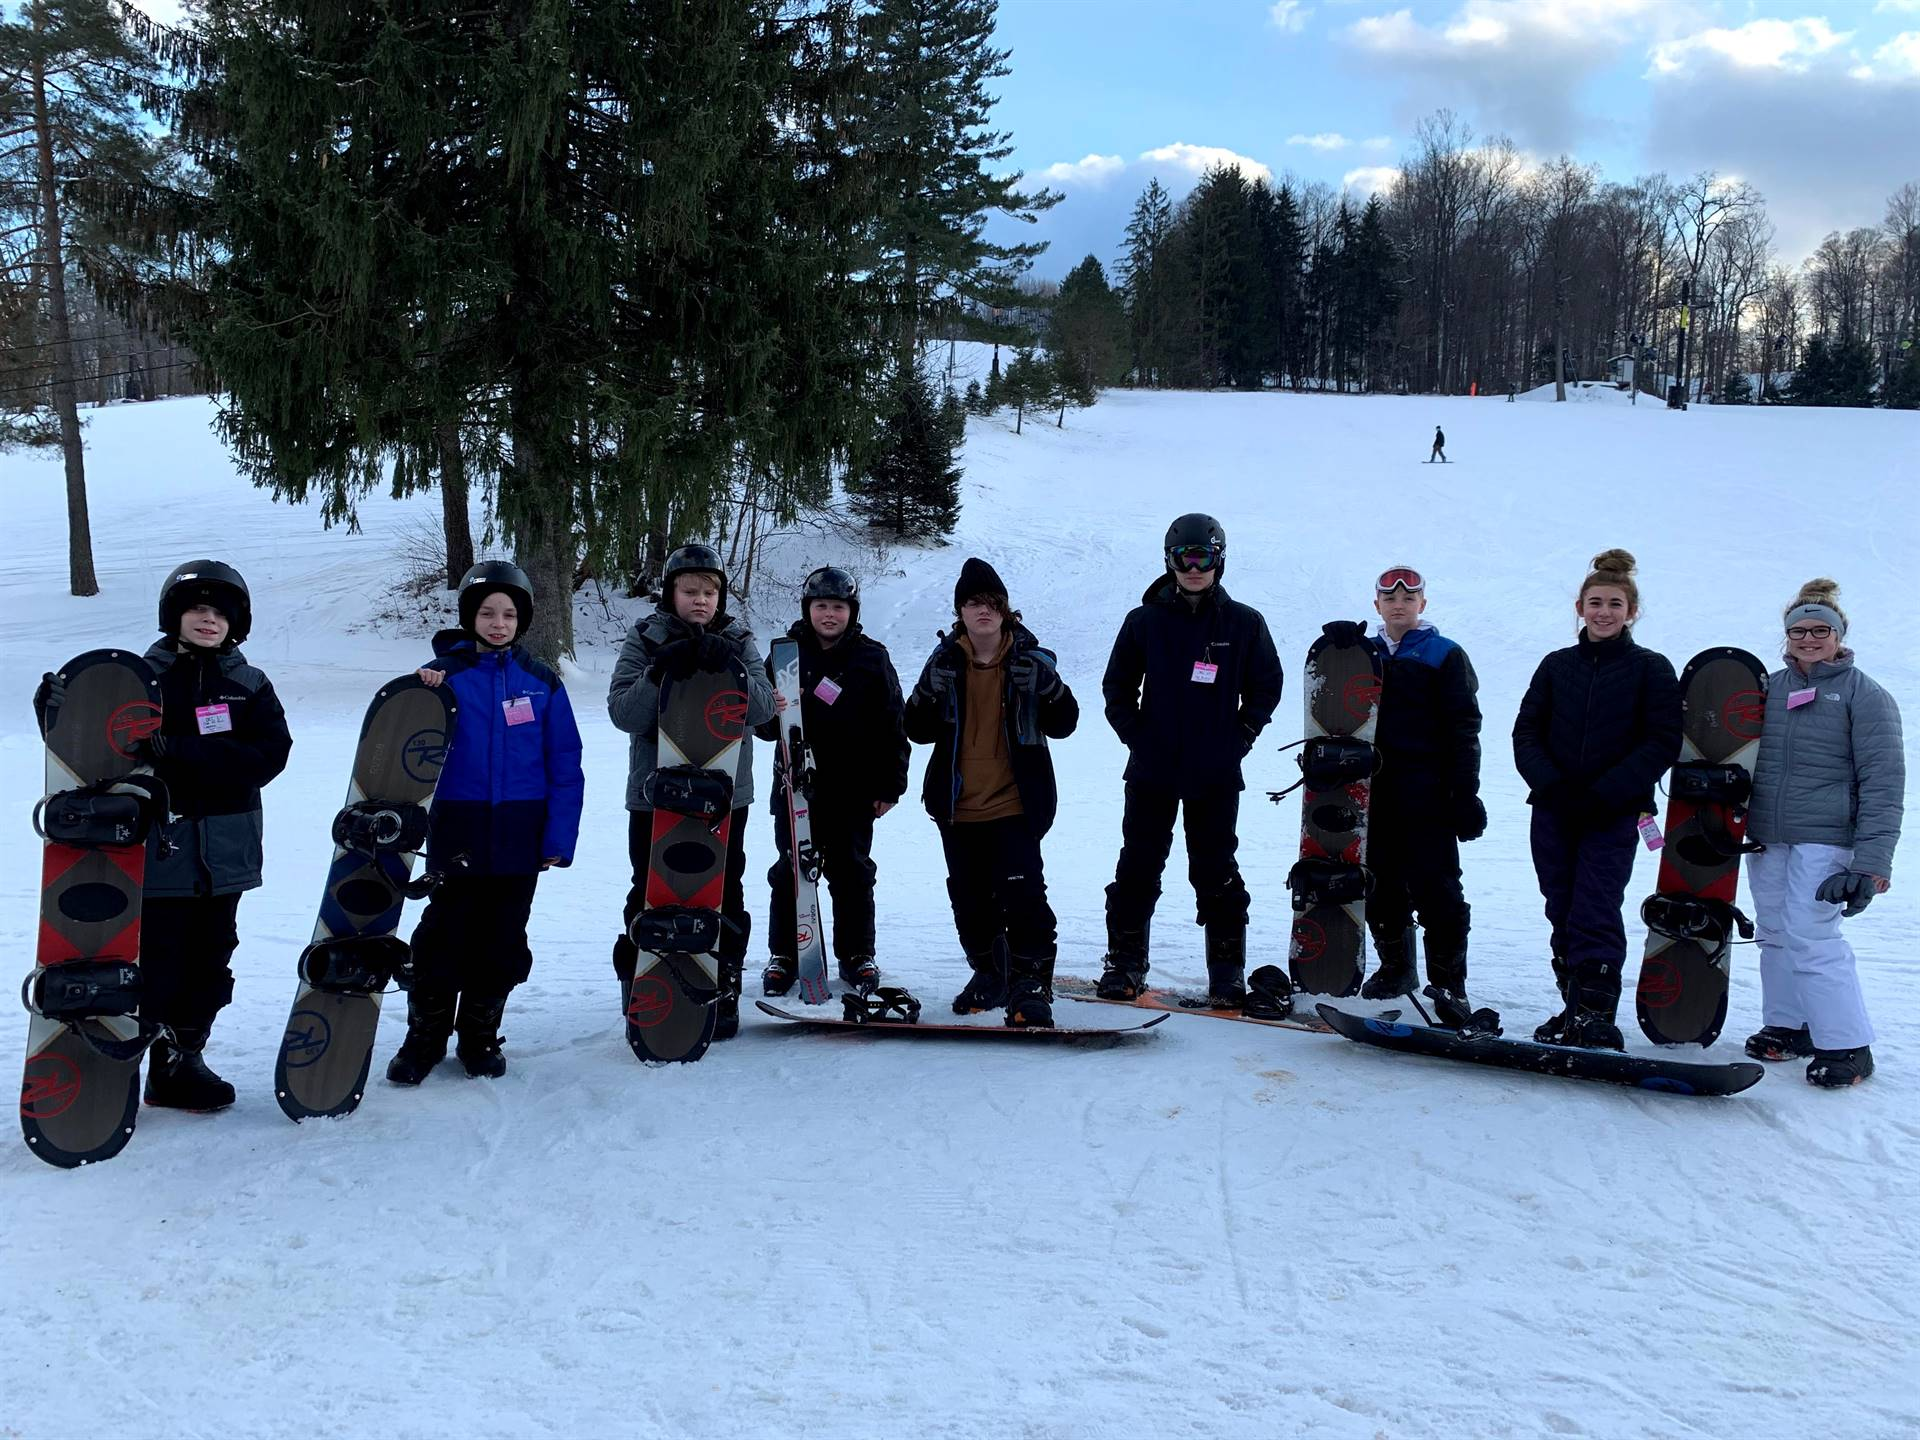 Ski Club and Bad Dog Boarders